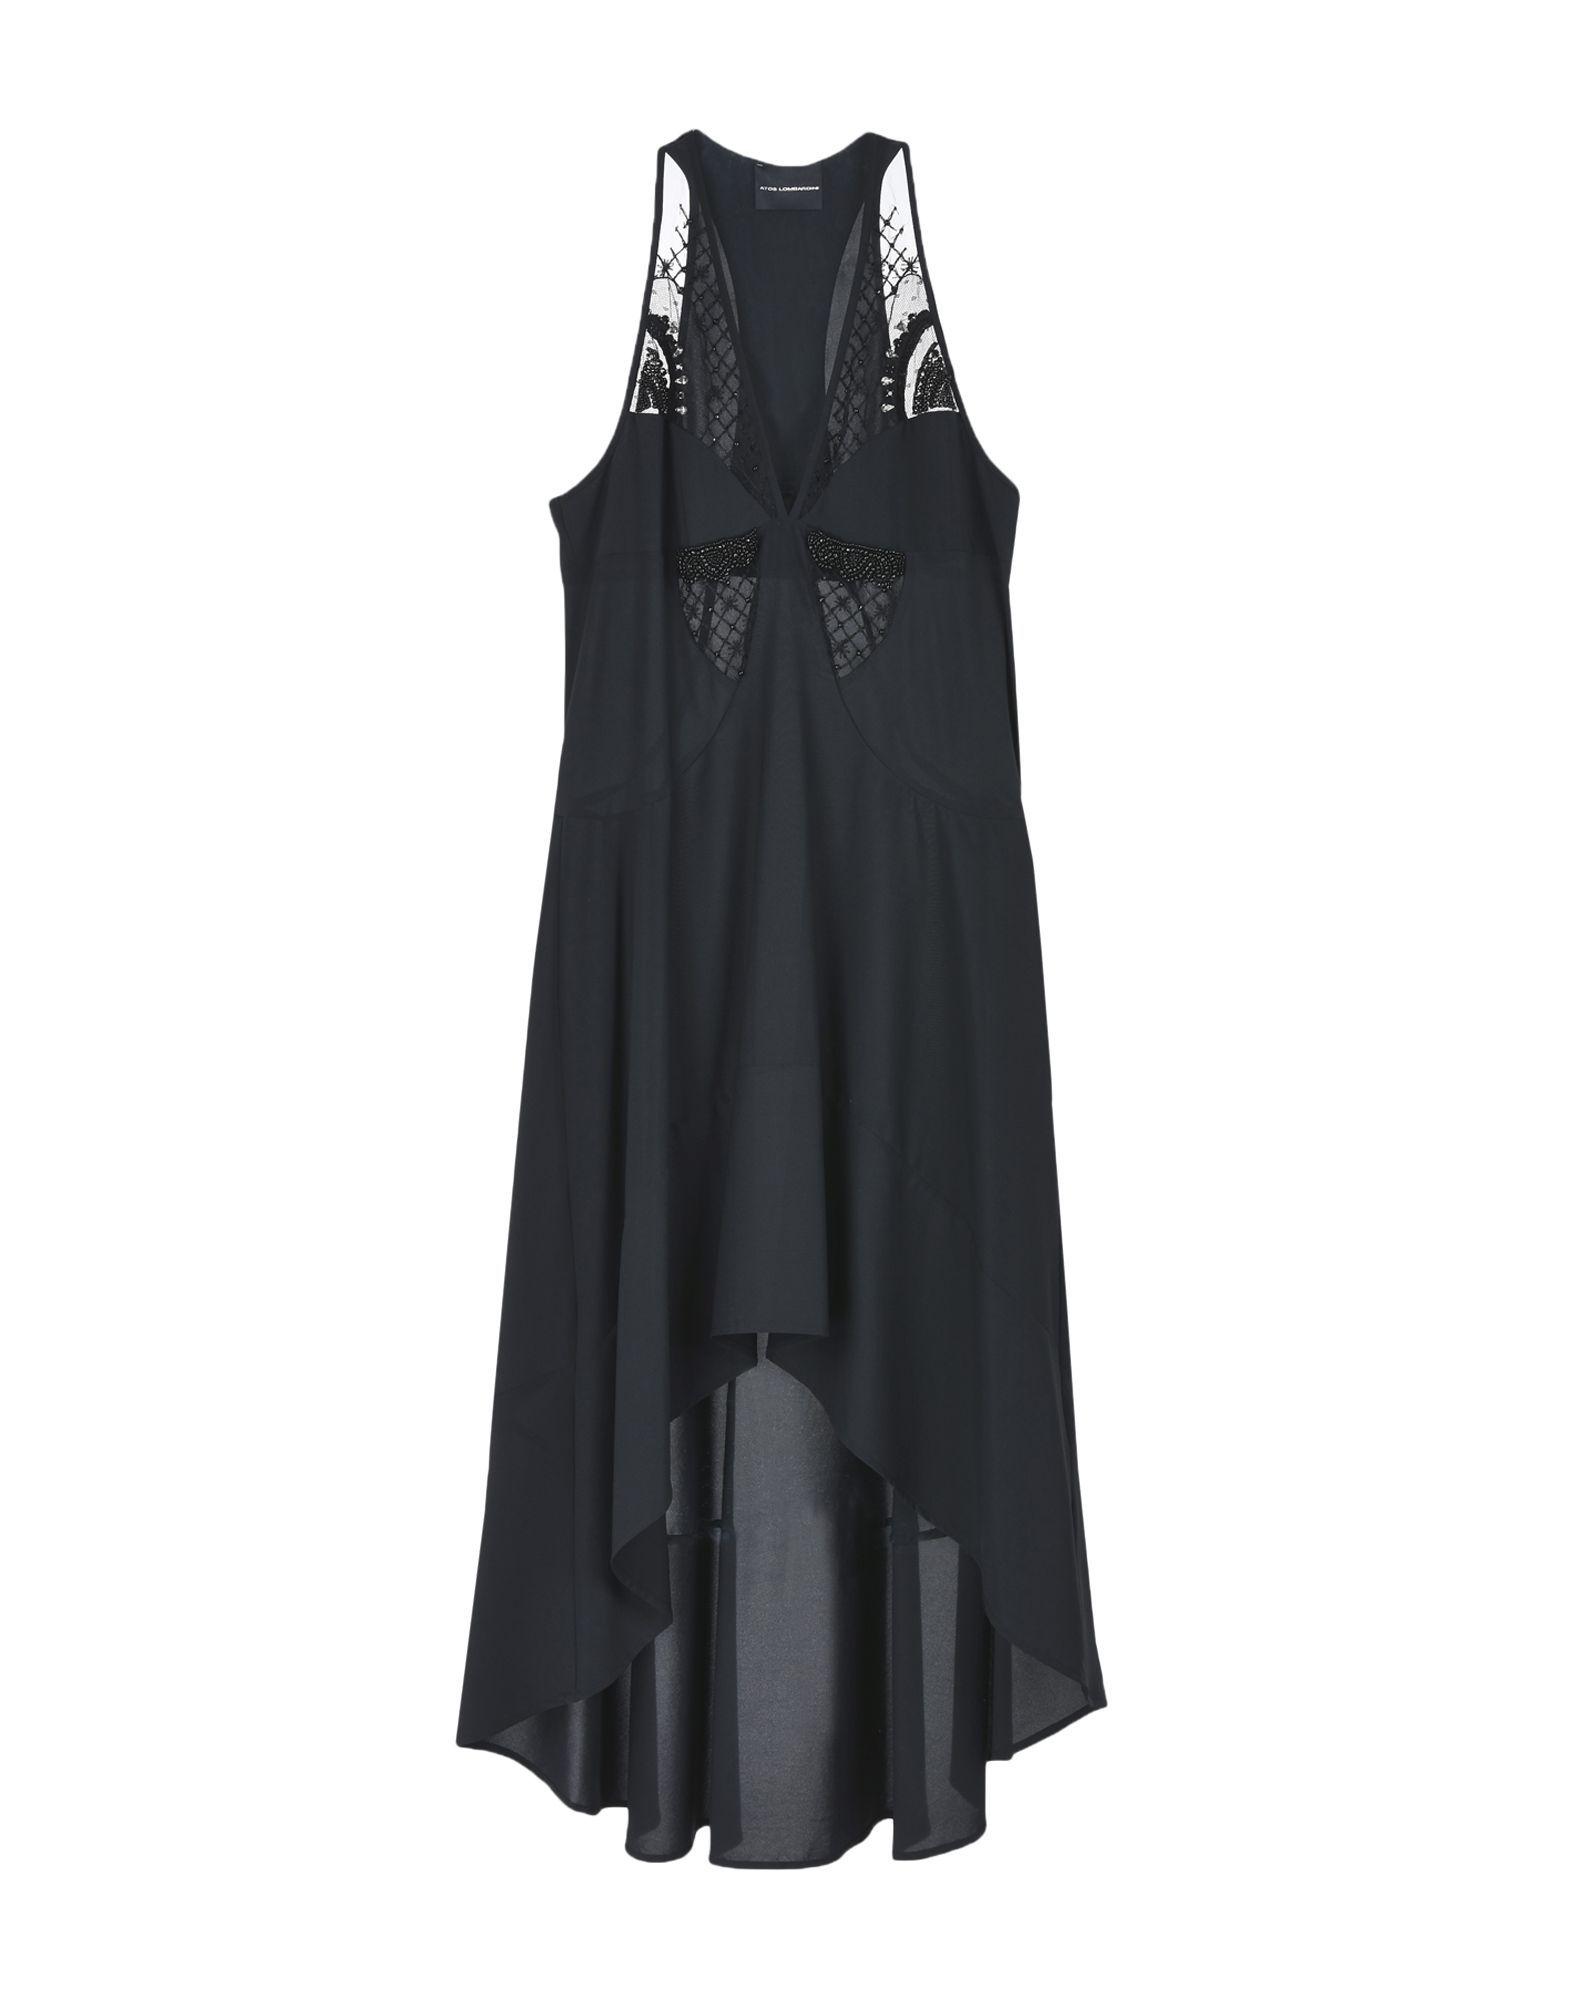 Atos Lombardini Black Crepe Beaded Sleeveless Dress